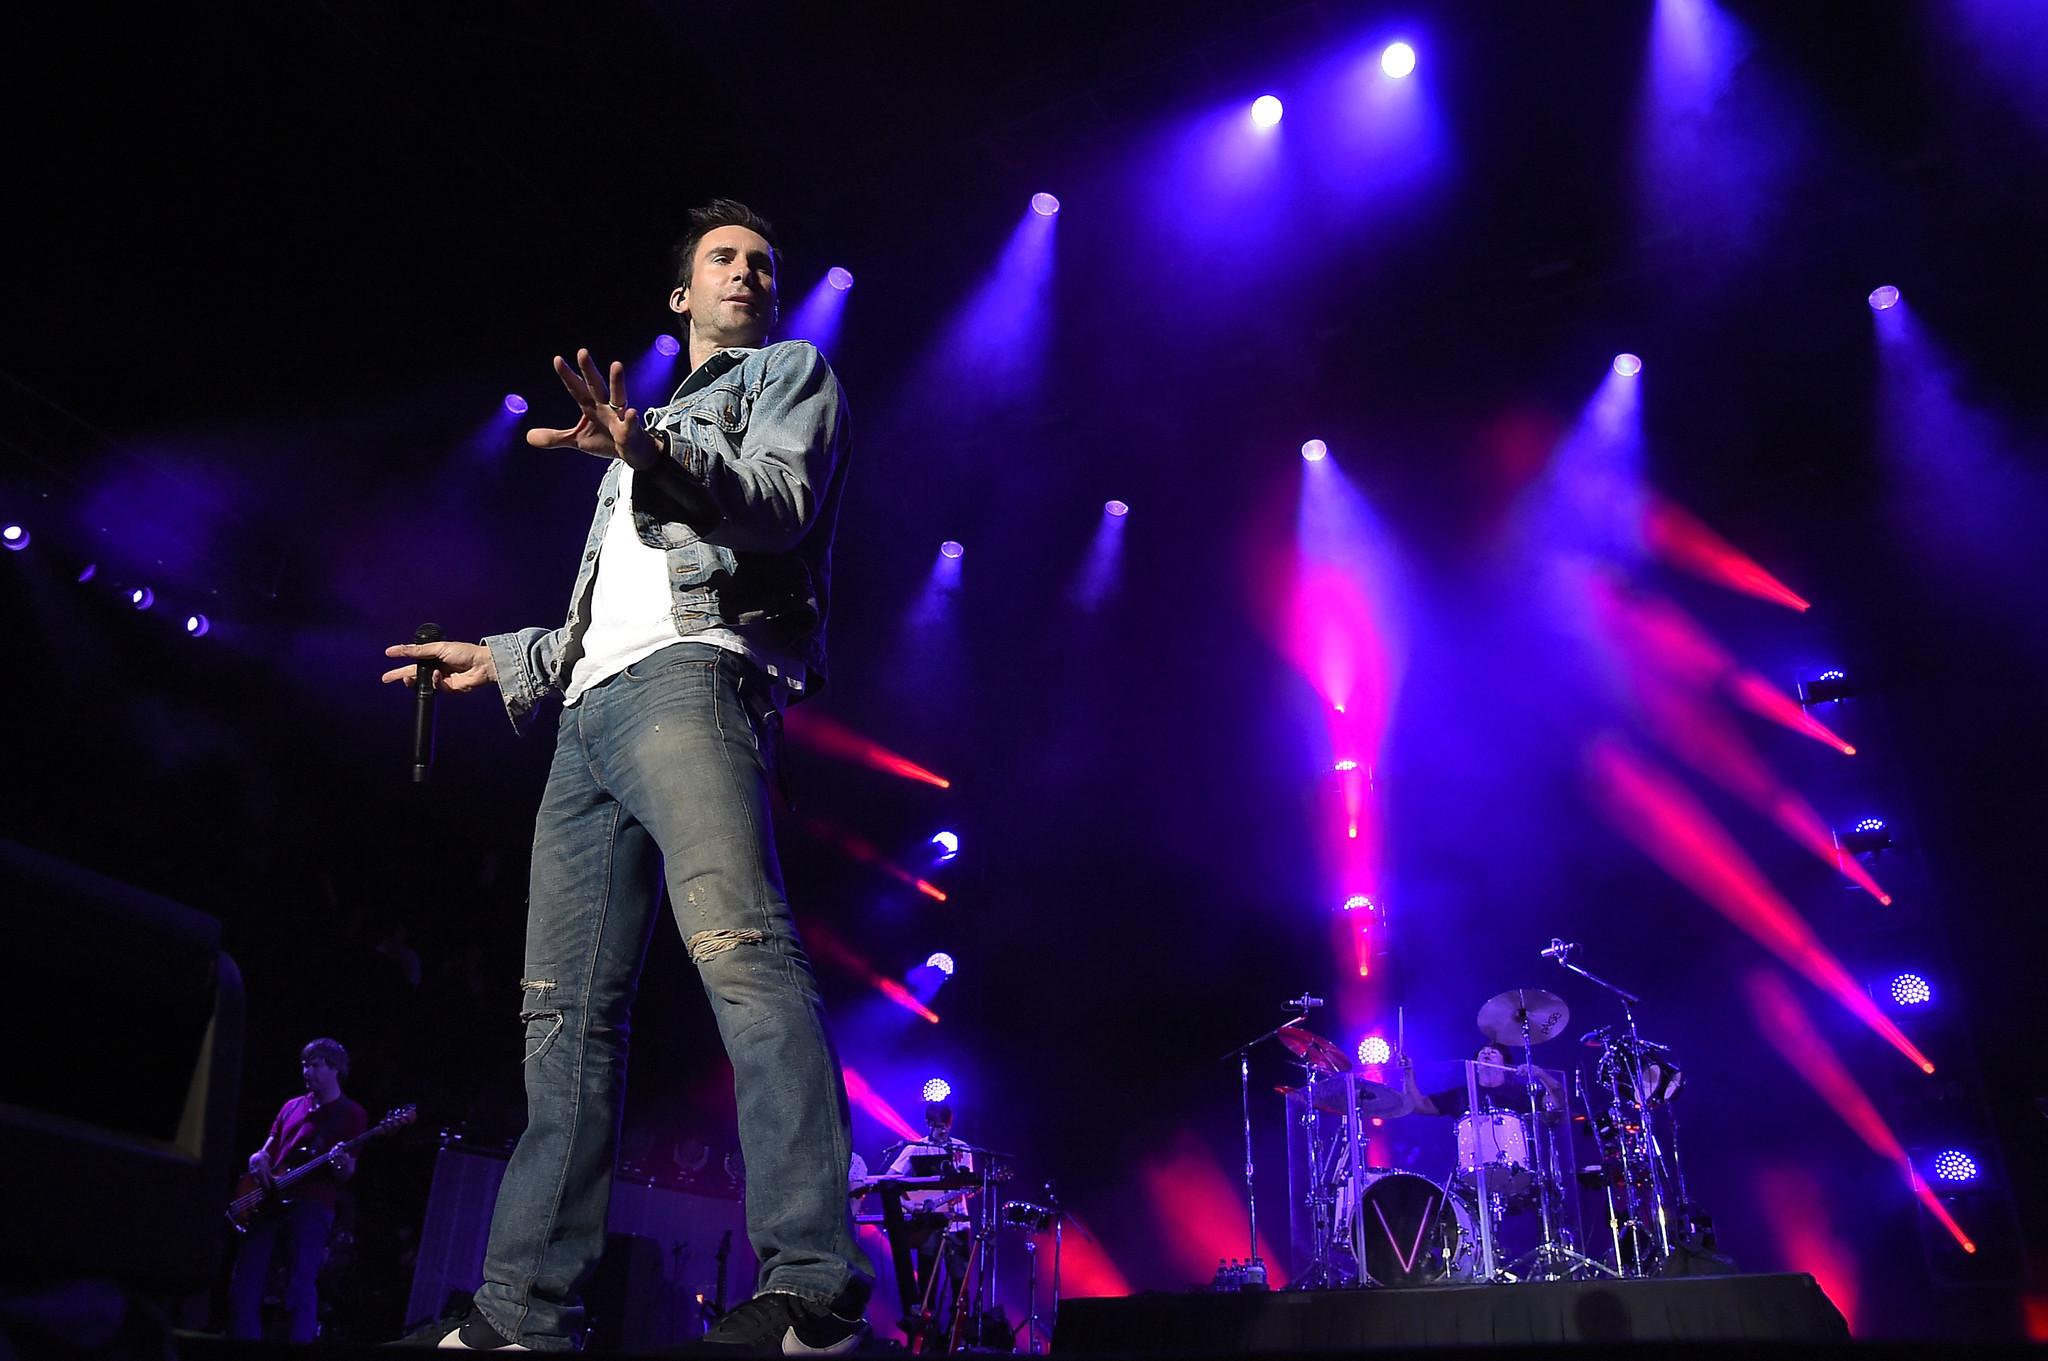 maroon 5 citing morality cancels north carolina concerts chicago tribune. Black Bedroom Furniture Sets. Home Design Ideas